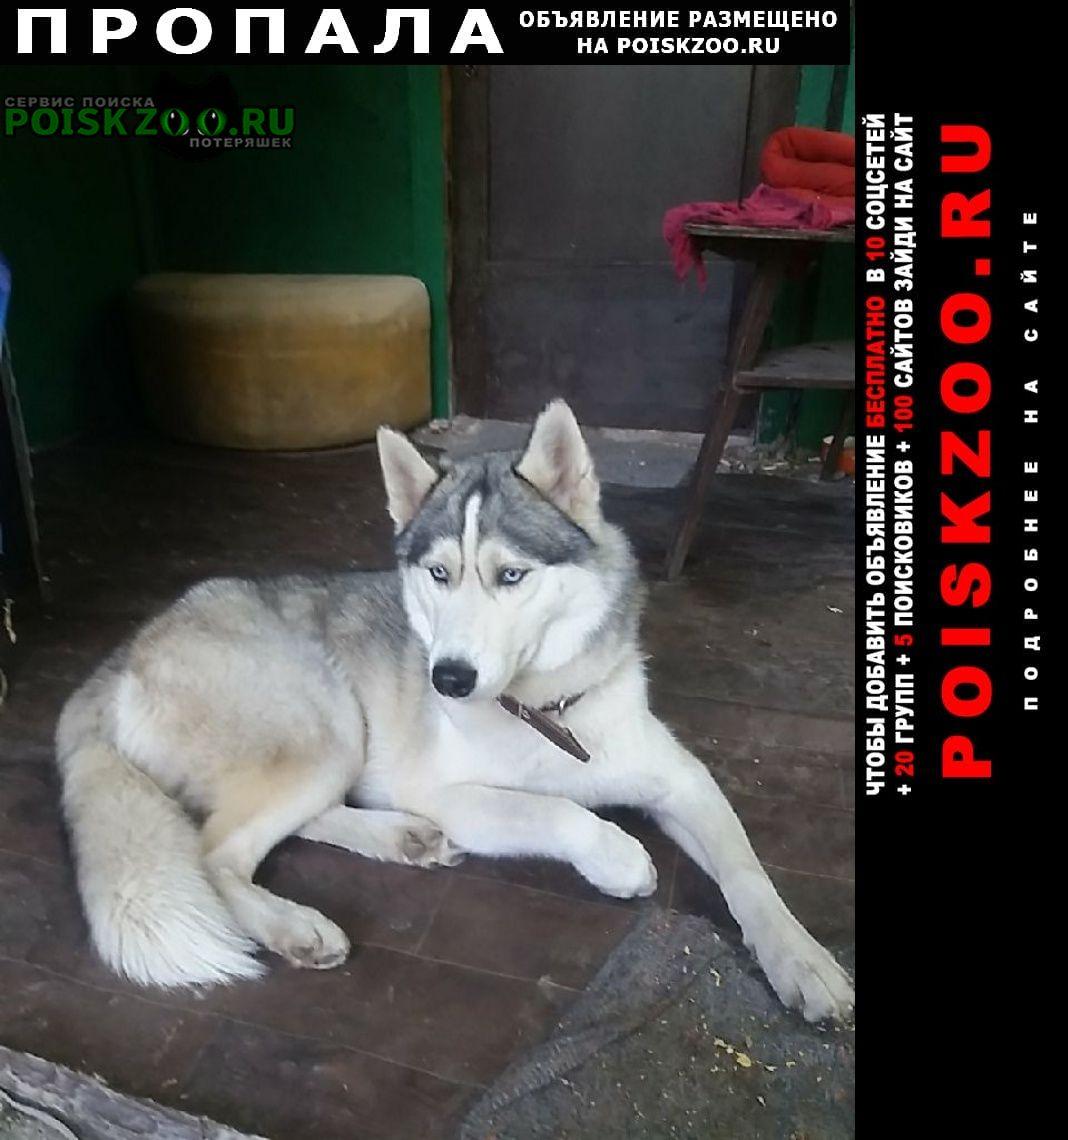 Самара Пропала собака убежал и не вернулся